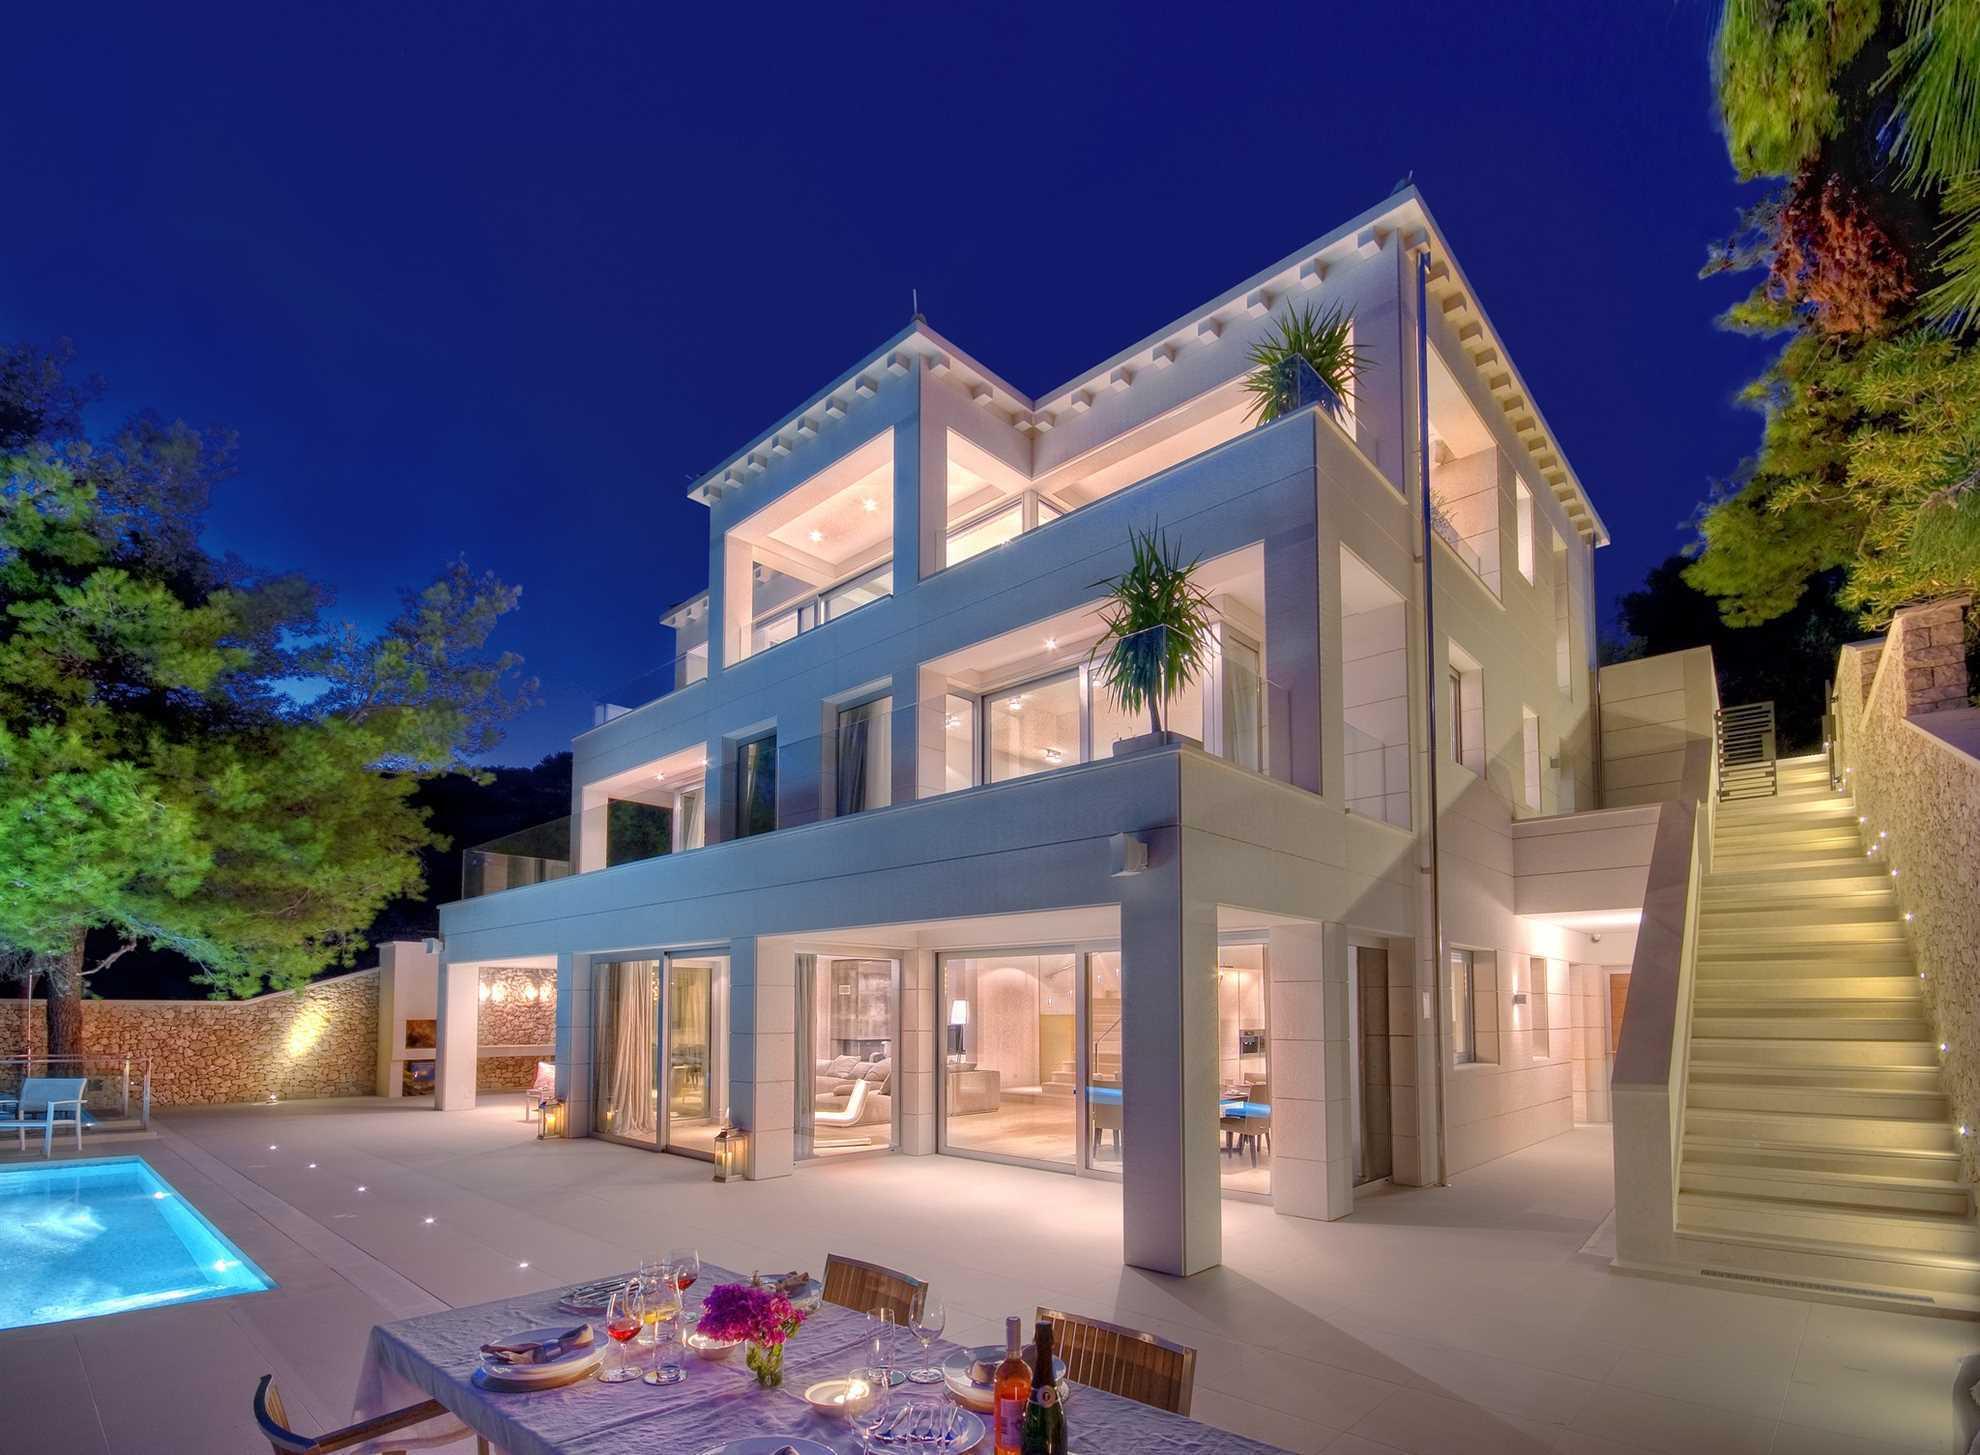 Luxurious Villa Sweet Dream with Swimming Pool by Night , Brac, Croatia